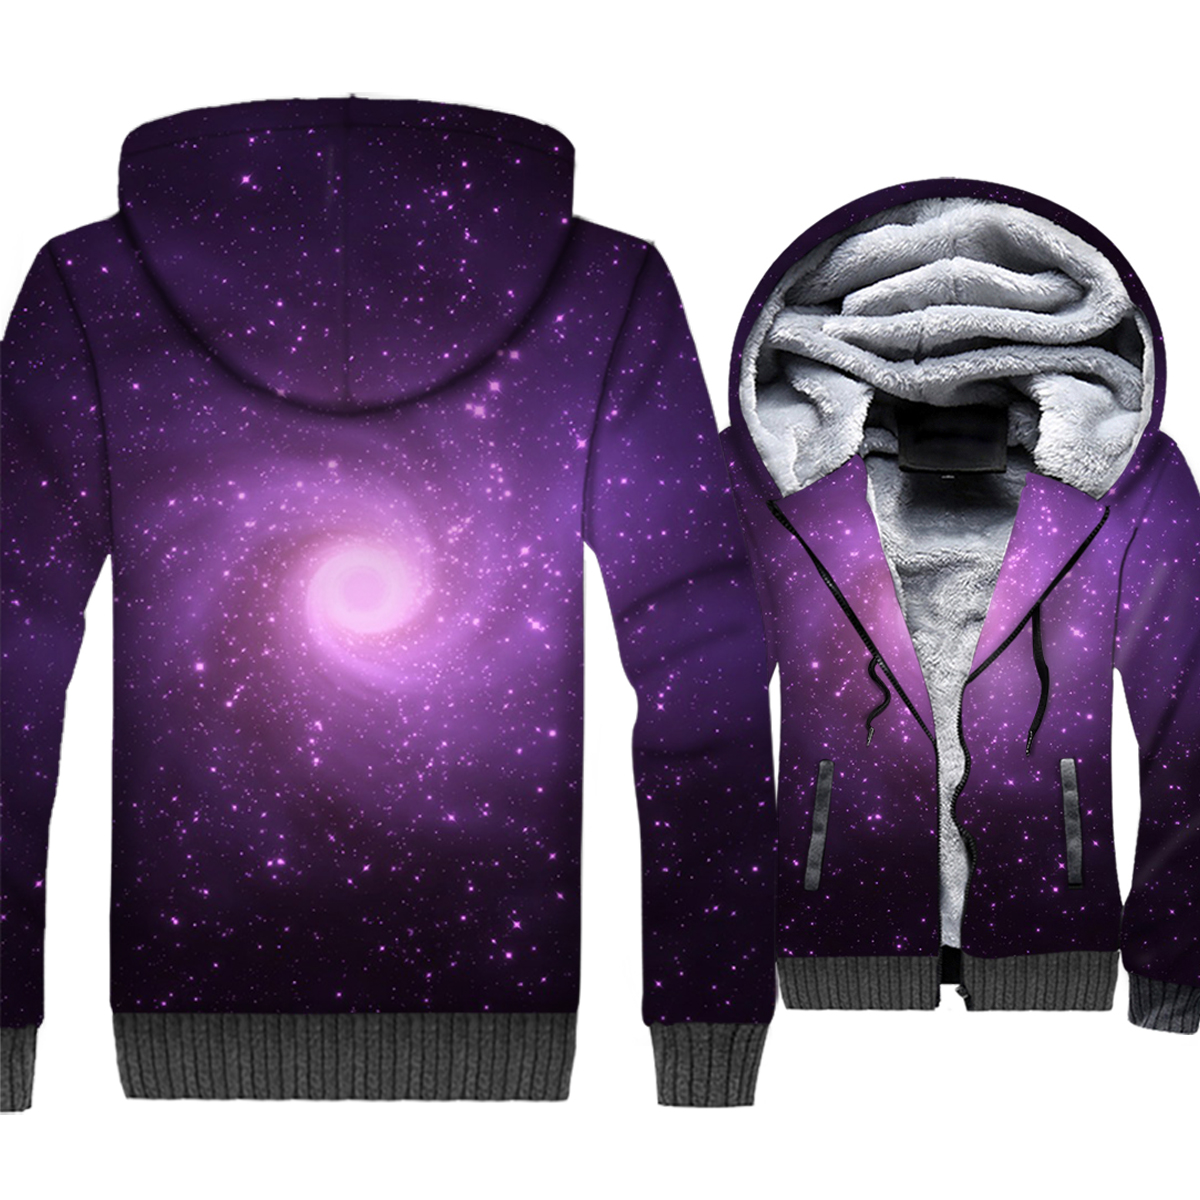 Space Galaxy 3D Print Hoodie Men Colorful Nebula Hooded Sweatshirt Harajuku Coat Winter Thick Fleece Warm Paisley Nebula Jacket